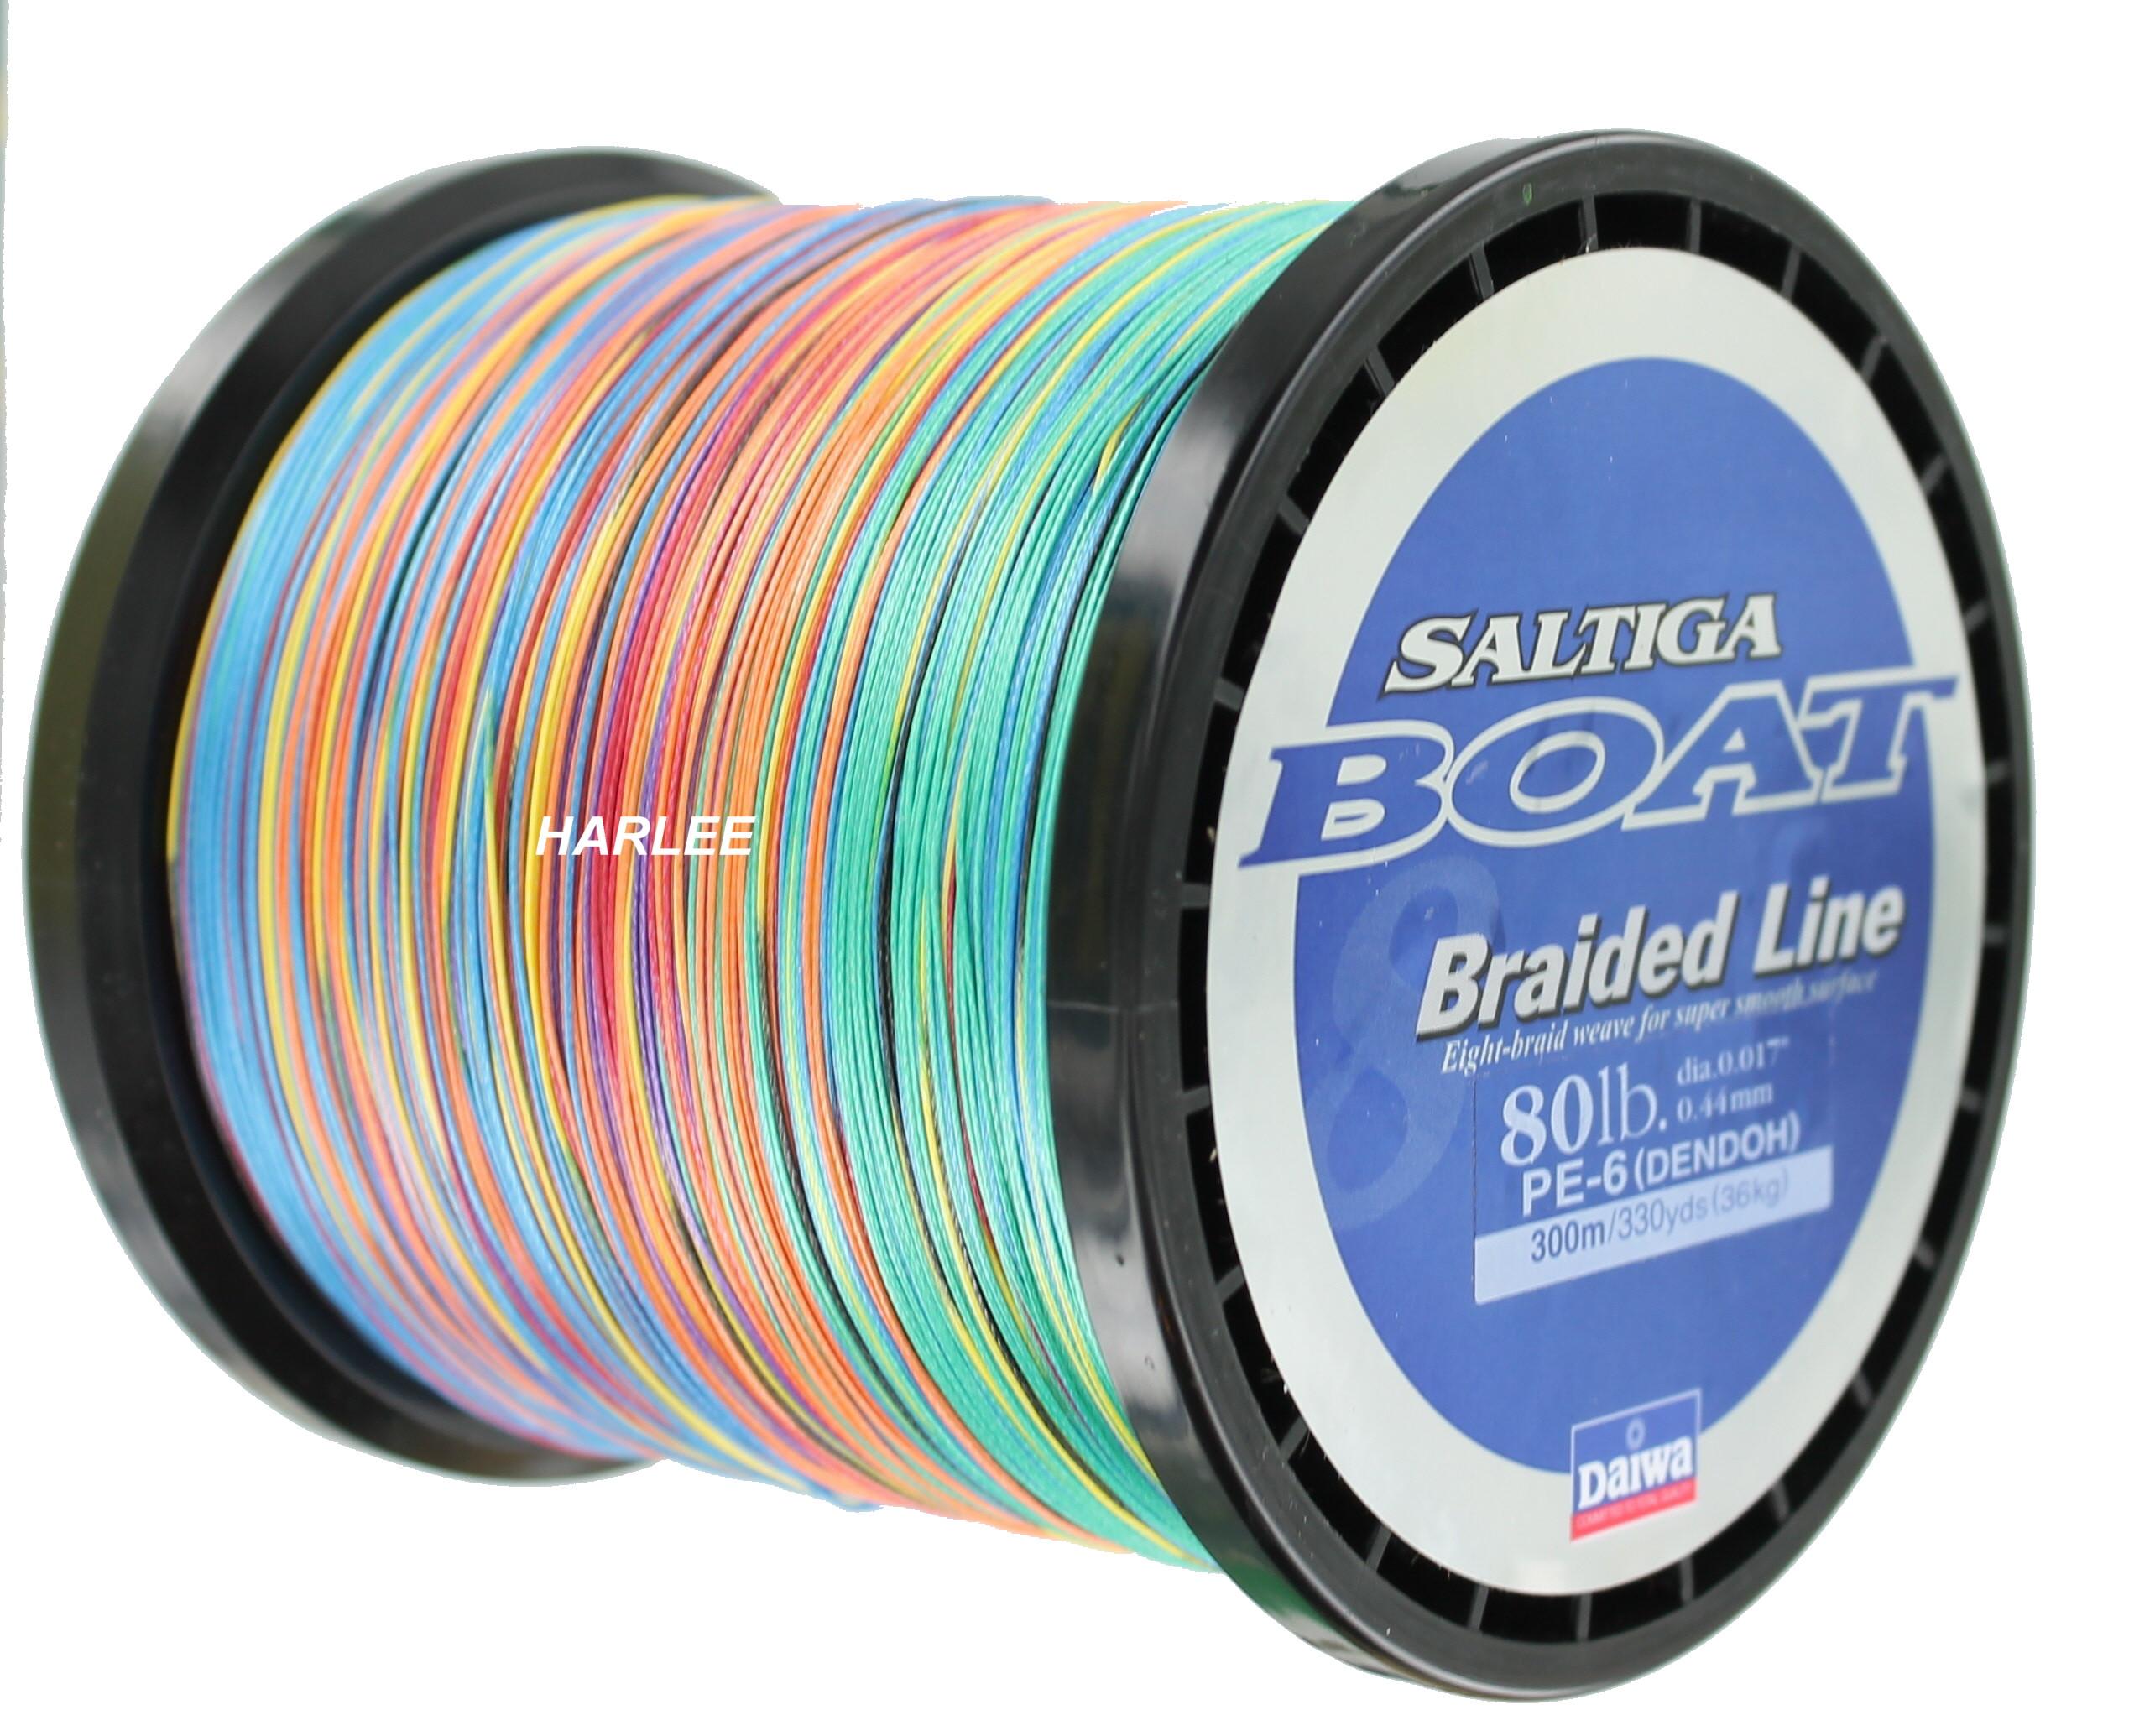 Daiwa saltiga boat braided fishing line 330yds 80lb sab for 80 lb braided fishing line